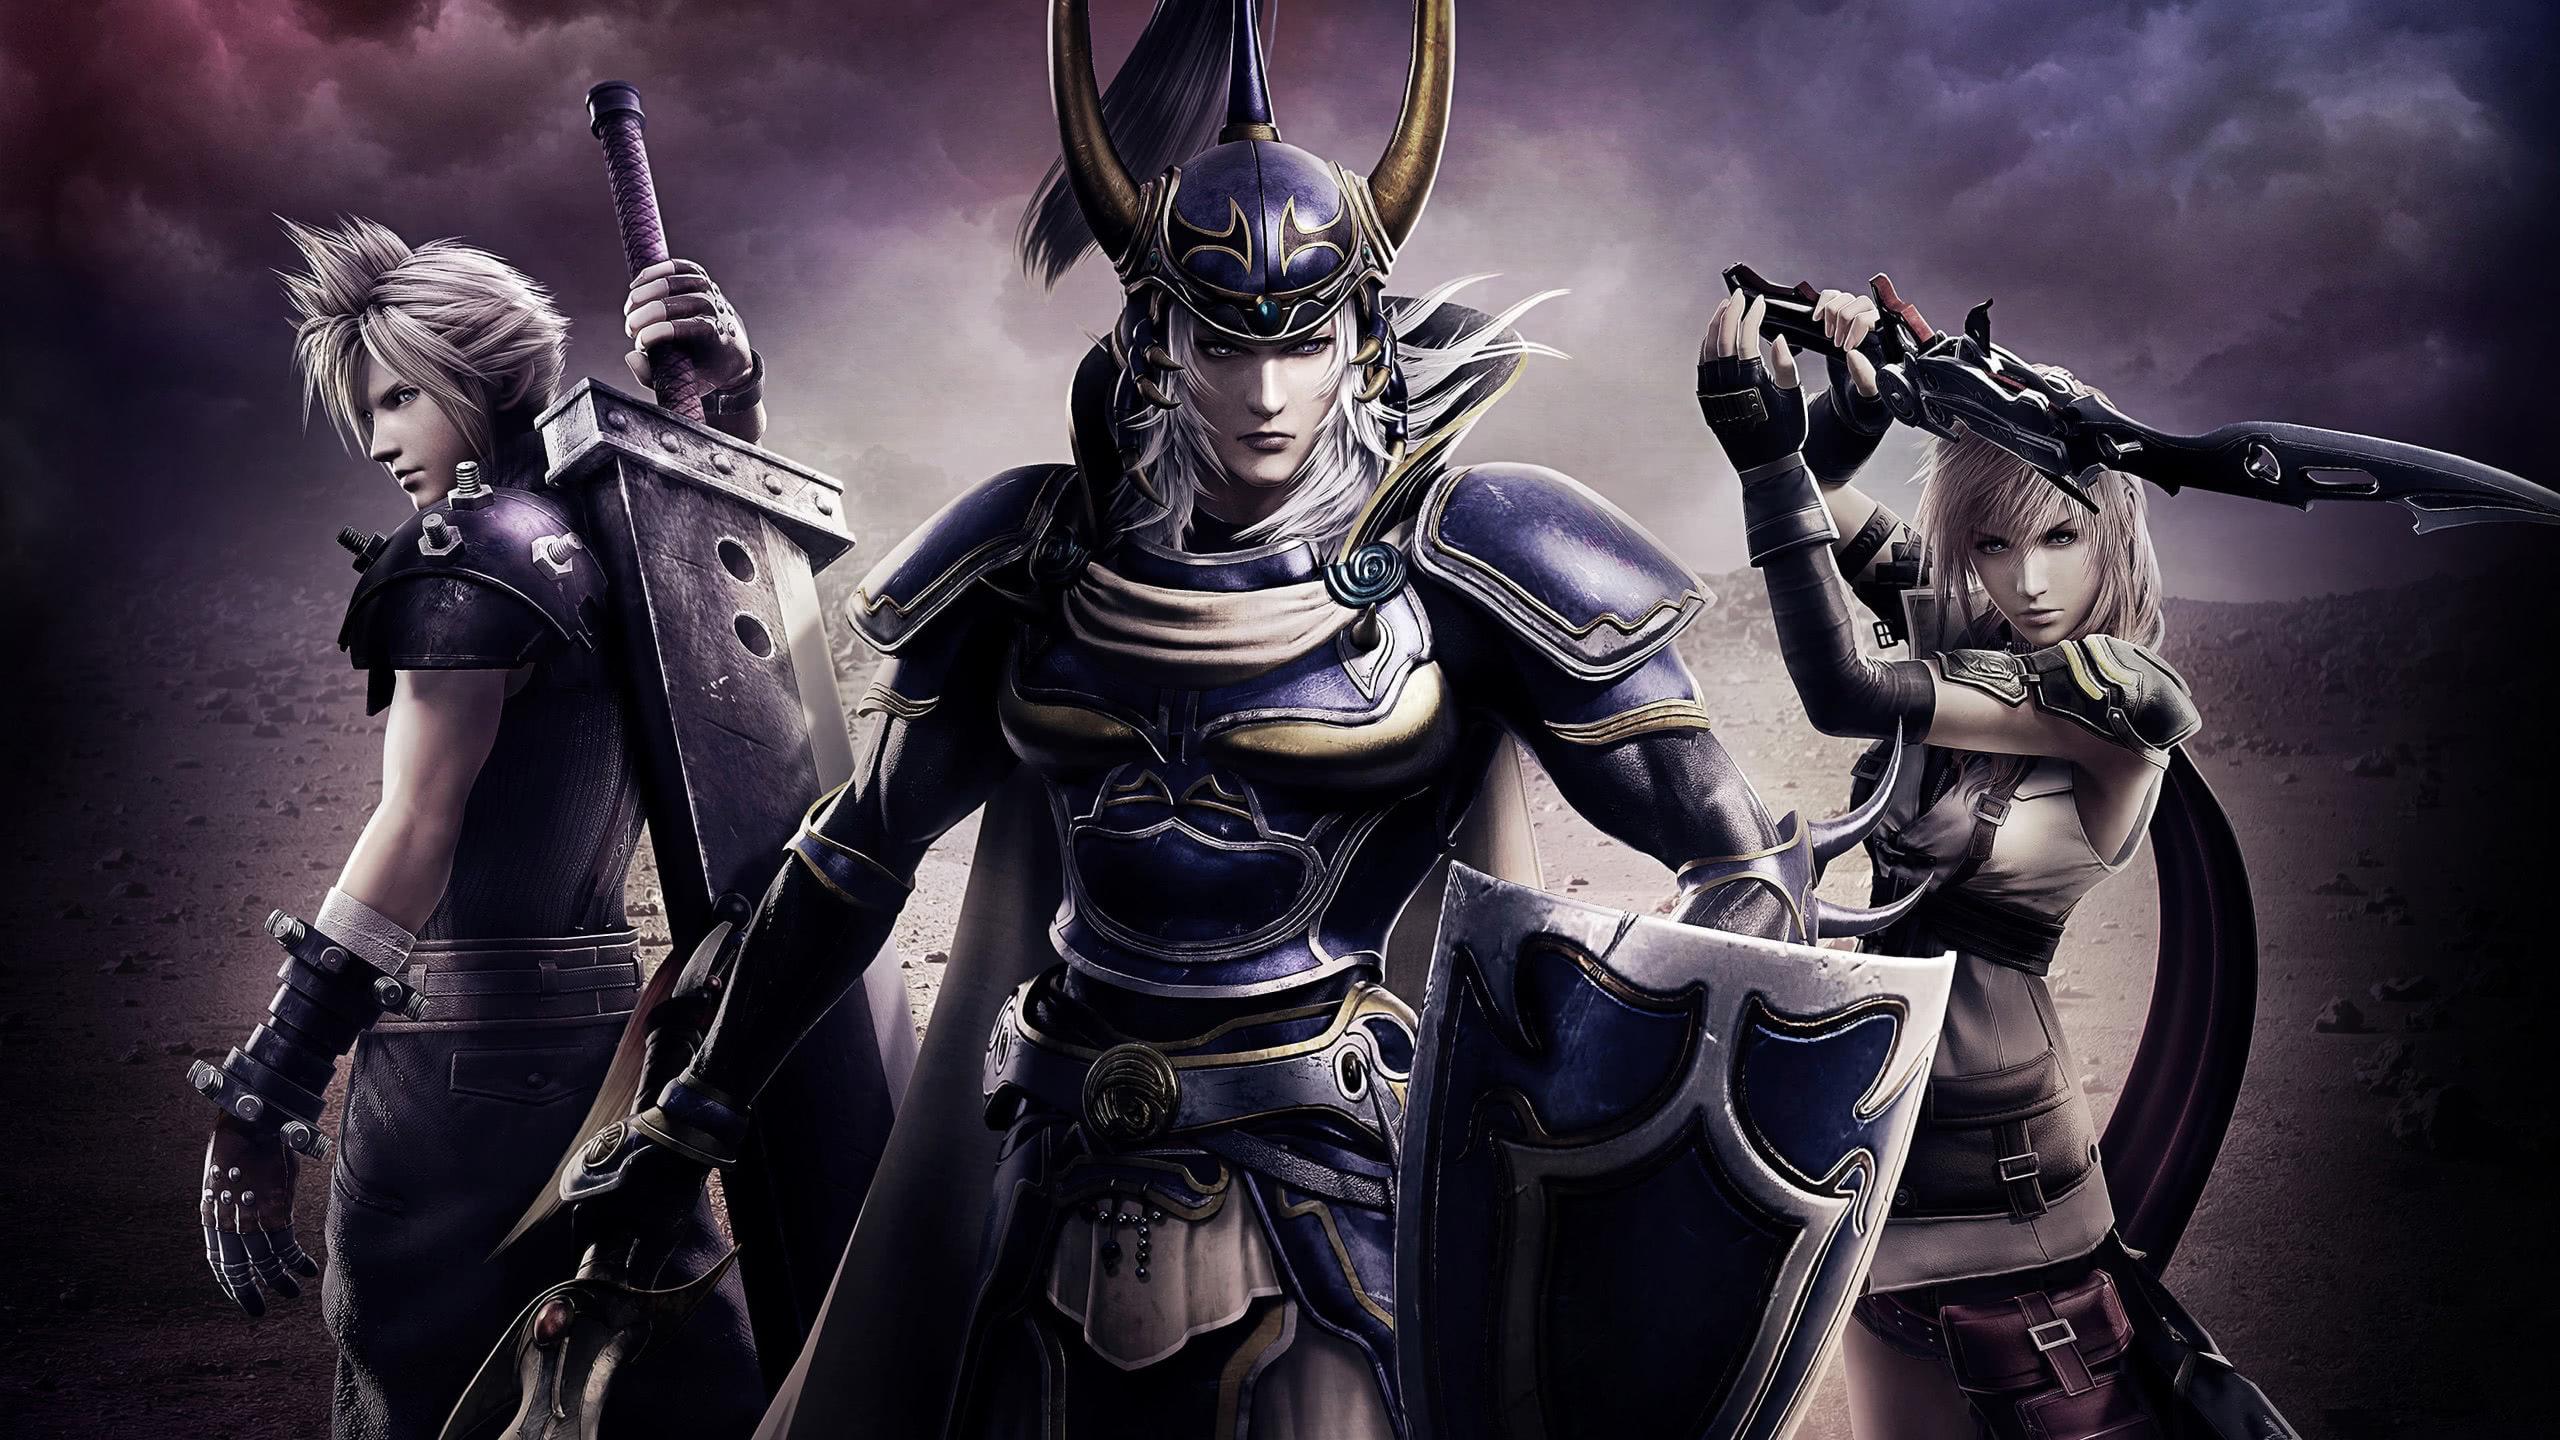 Dissidia Final Fantasy Nt Characters Wqhd 1440p Wallpaper Pixelz